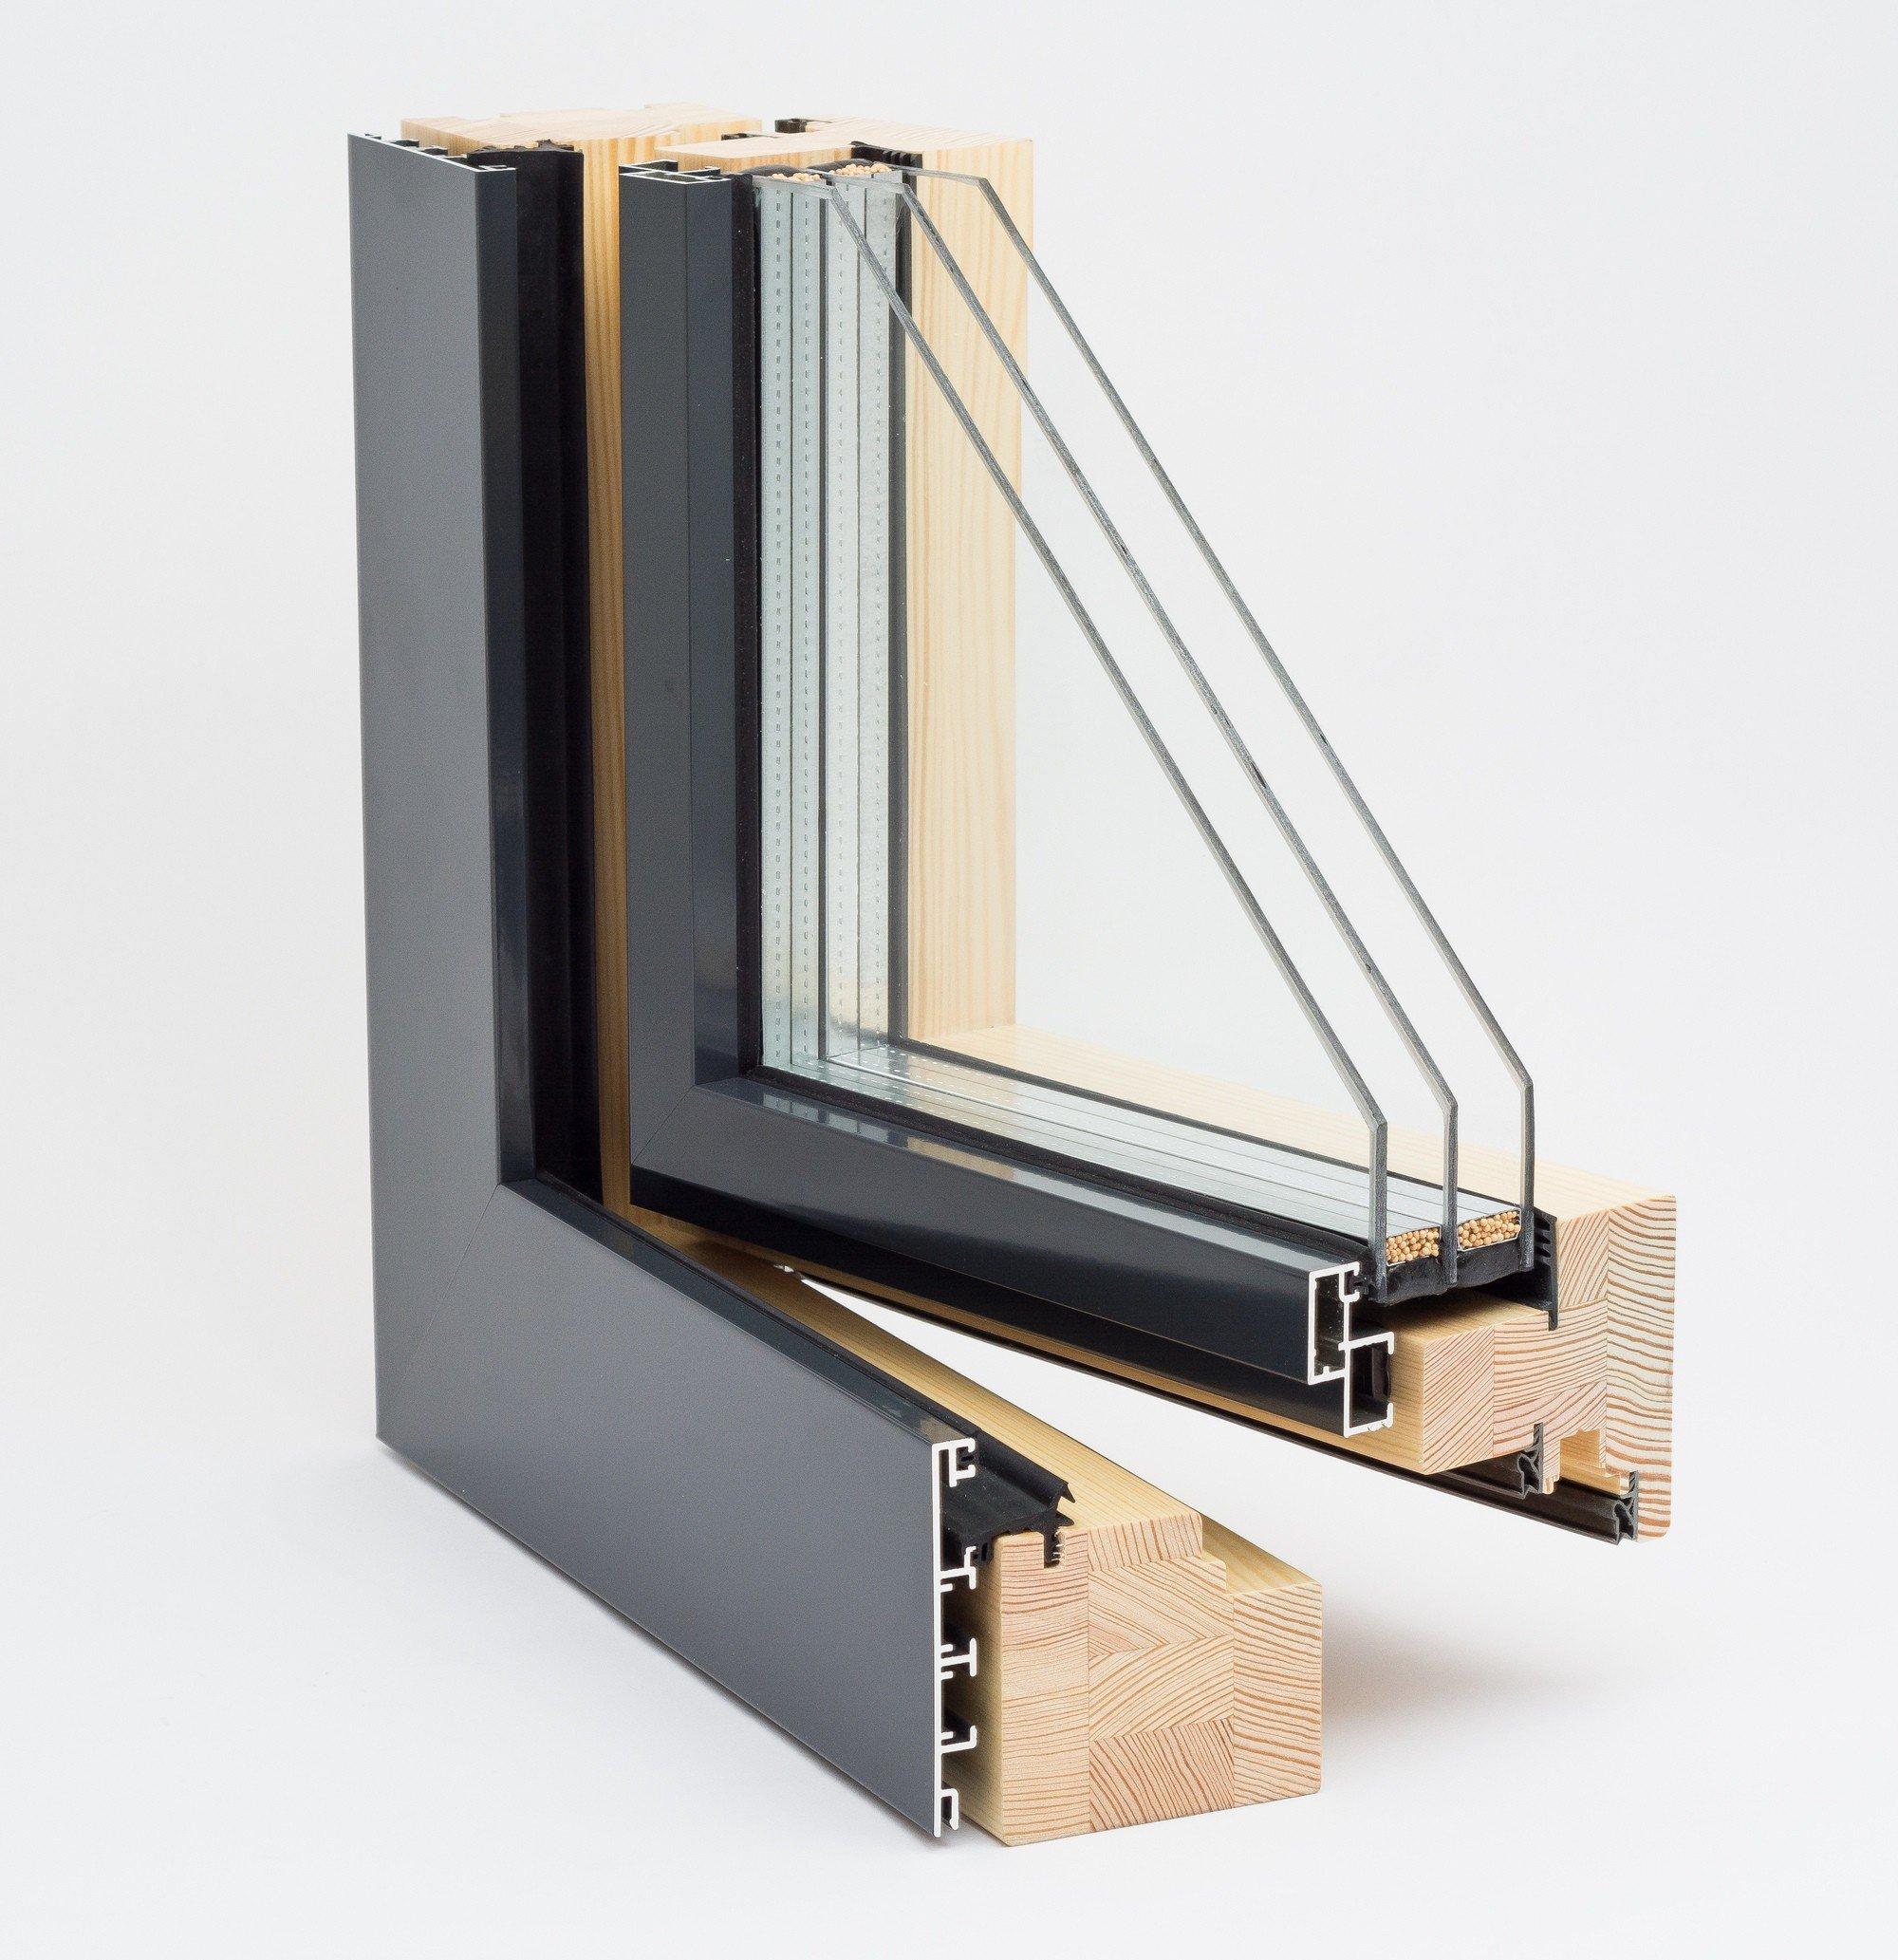 Holz alu fenster erfahrungen  Drutex S.A. - Pressroom - DRUTEX führt Holz-Aluminium-Fenster ein